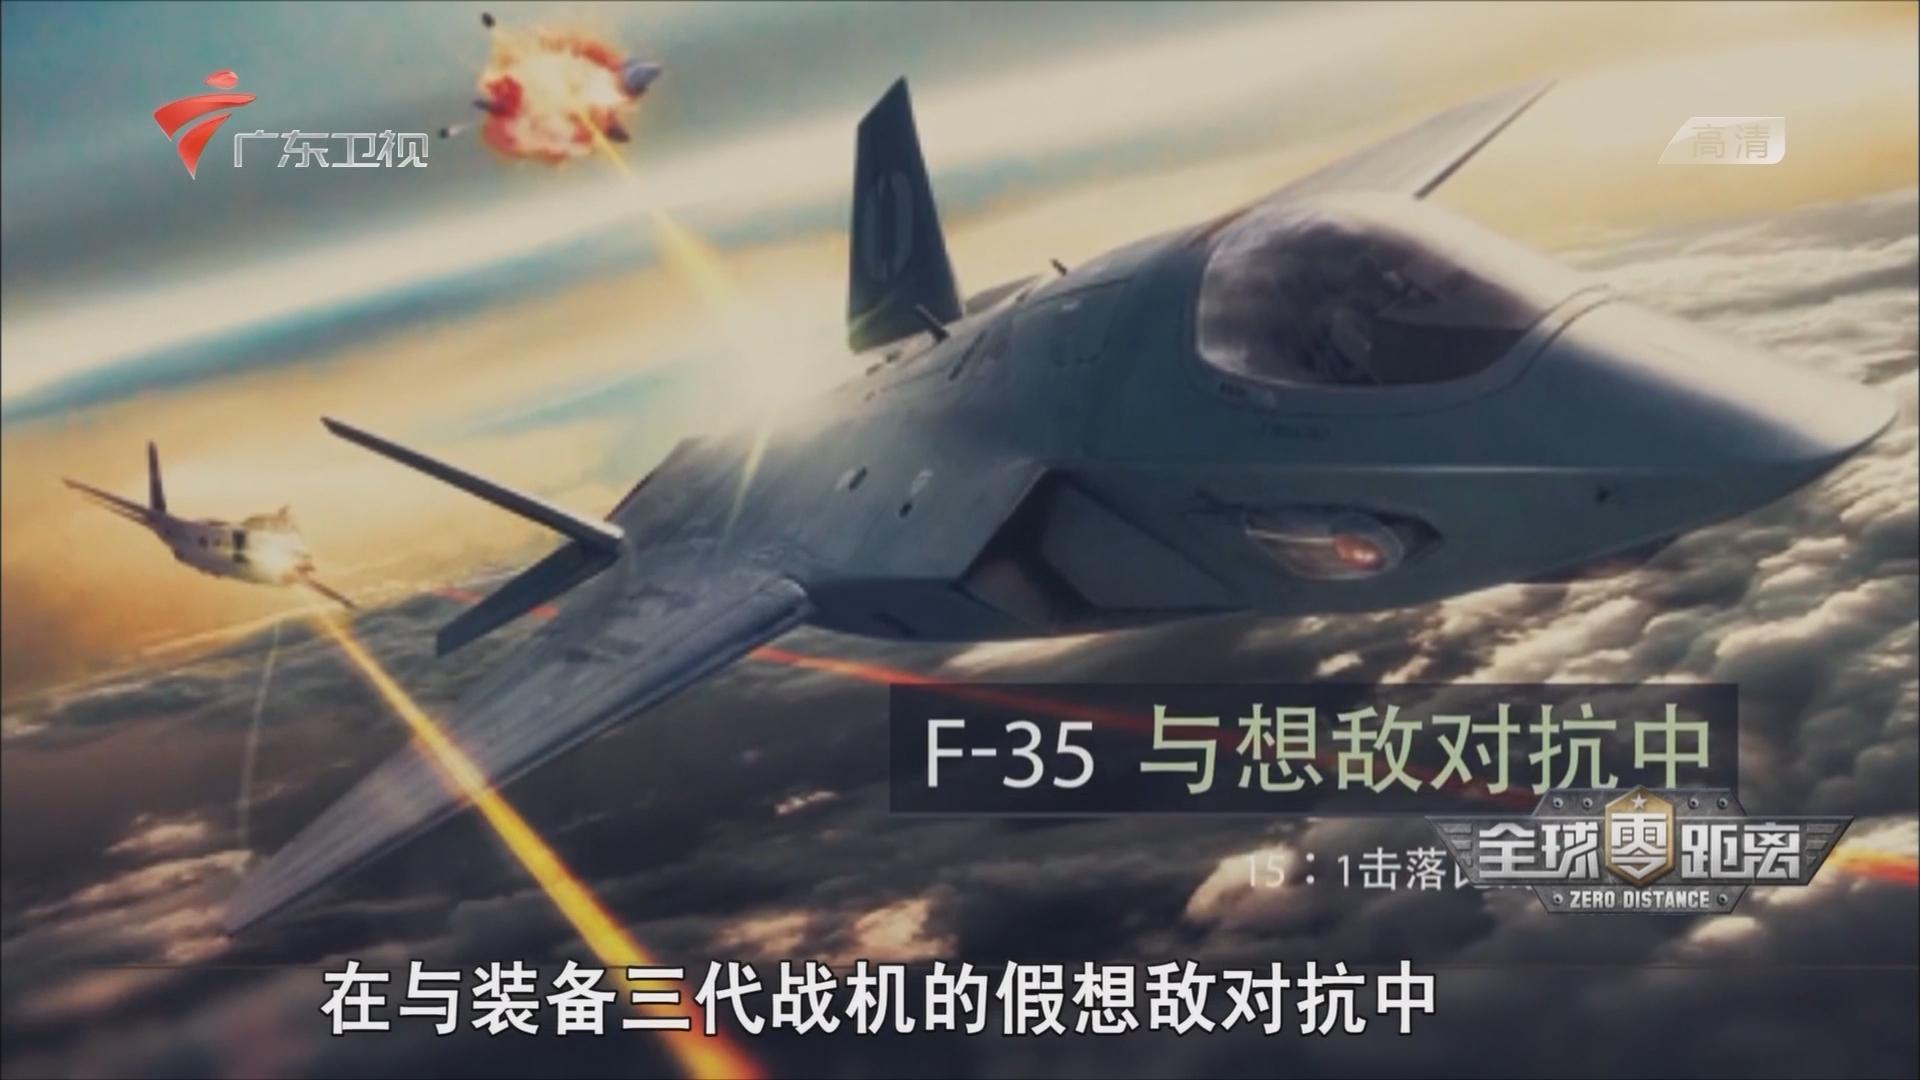 F35包围圈,中国如何突围?